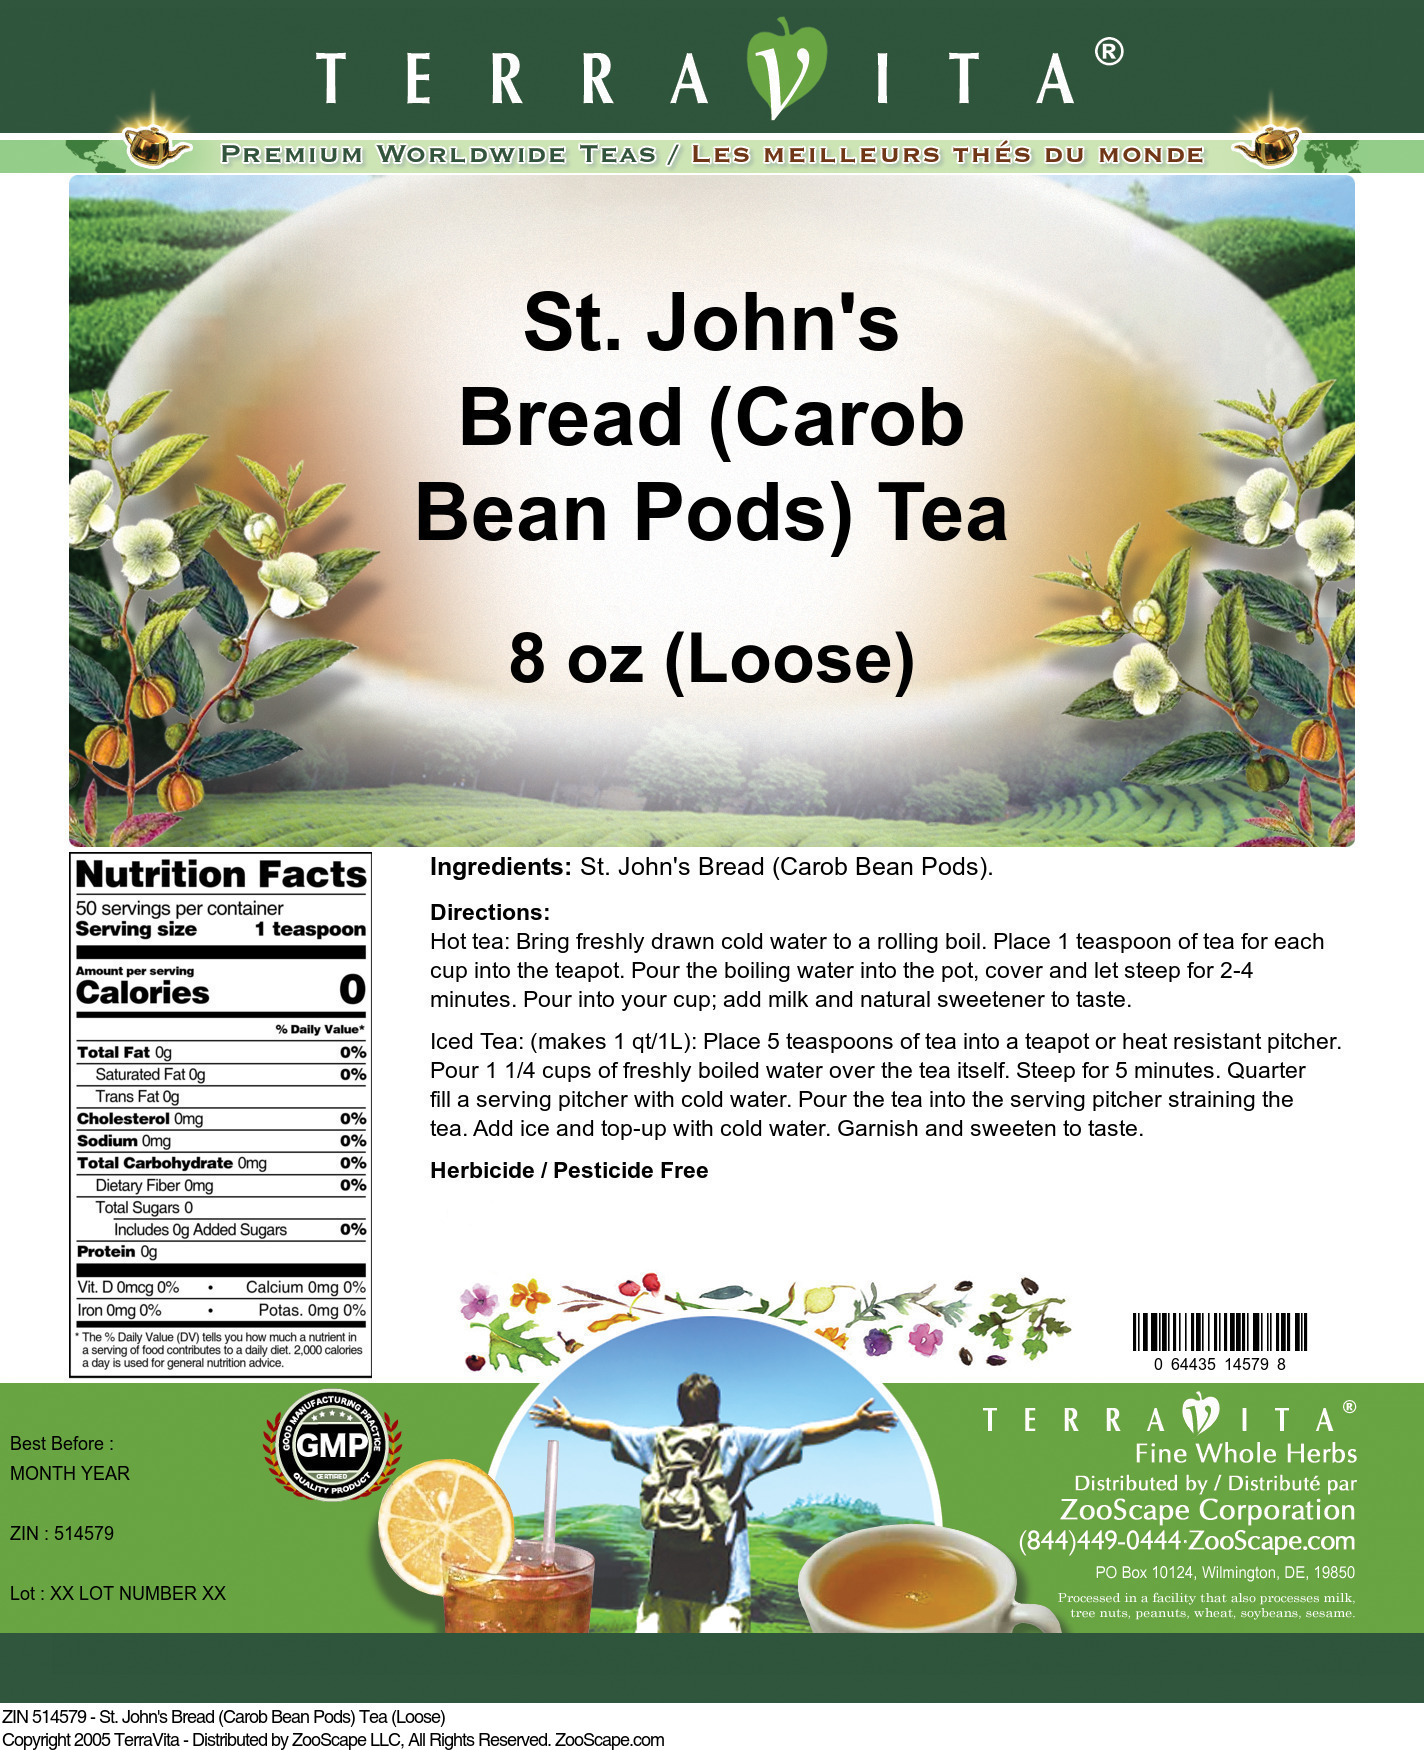 St. John's Bread (Carob Bean Pods) Tea (Loose)